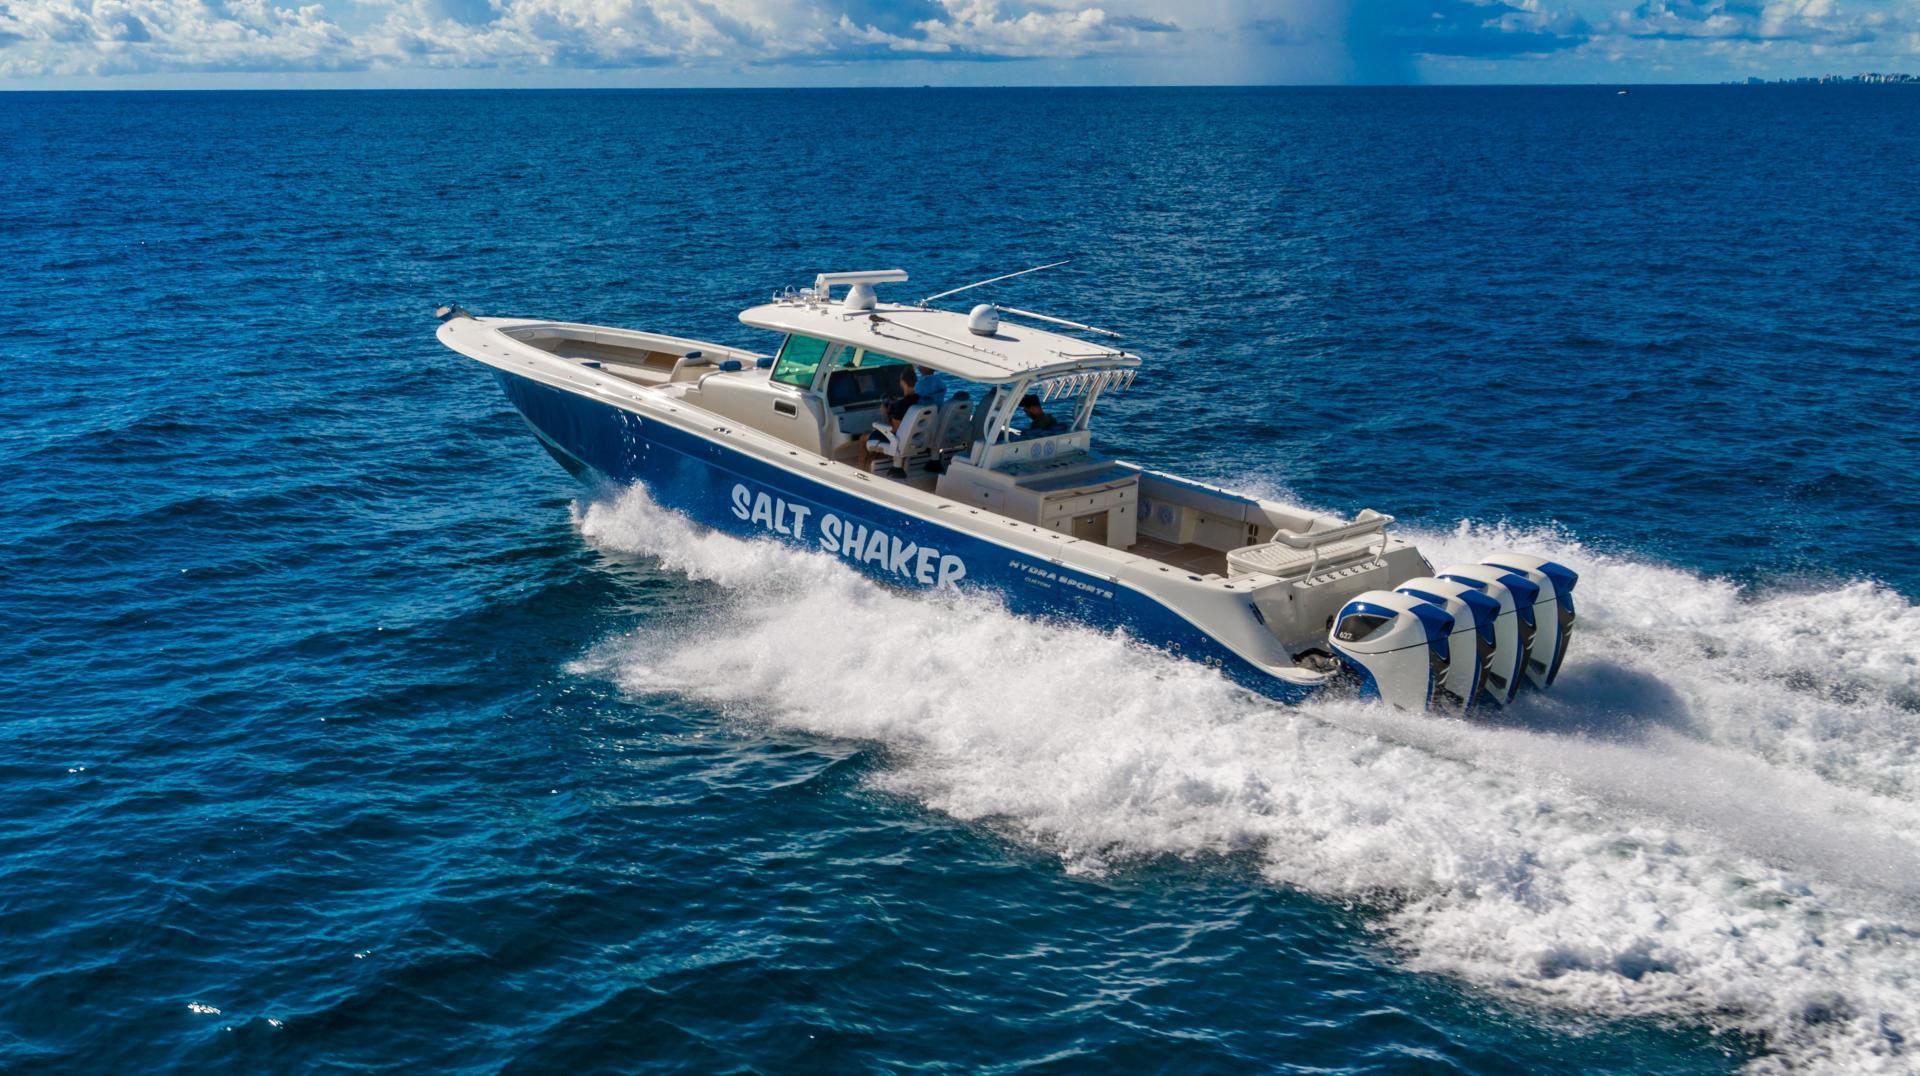 HCB-Suenos 2016-Salt Shaker Ft. Lauderdale-Florida-United States-1548627 | Thumbnail